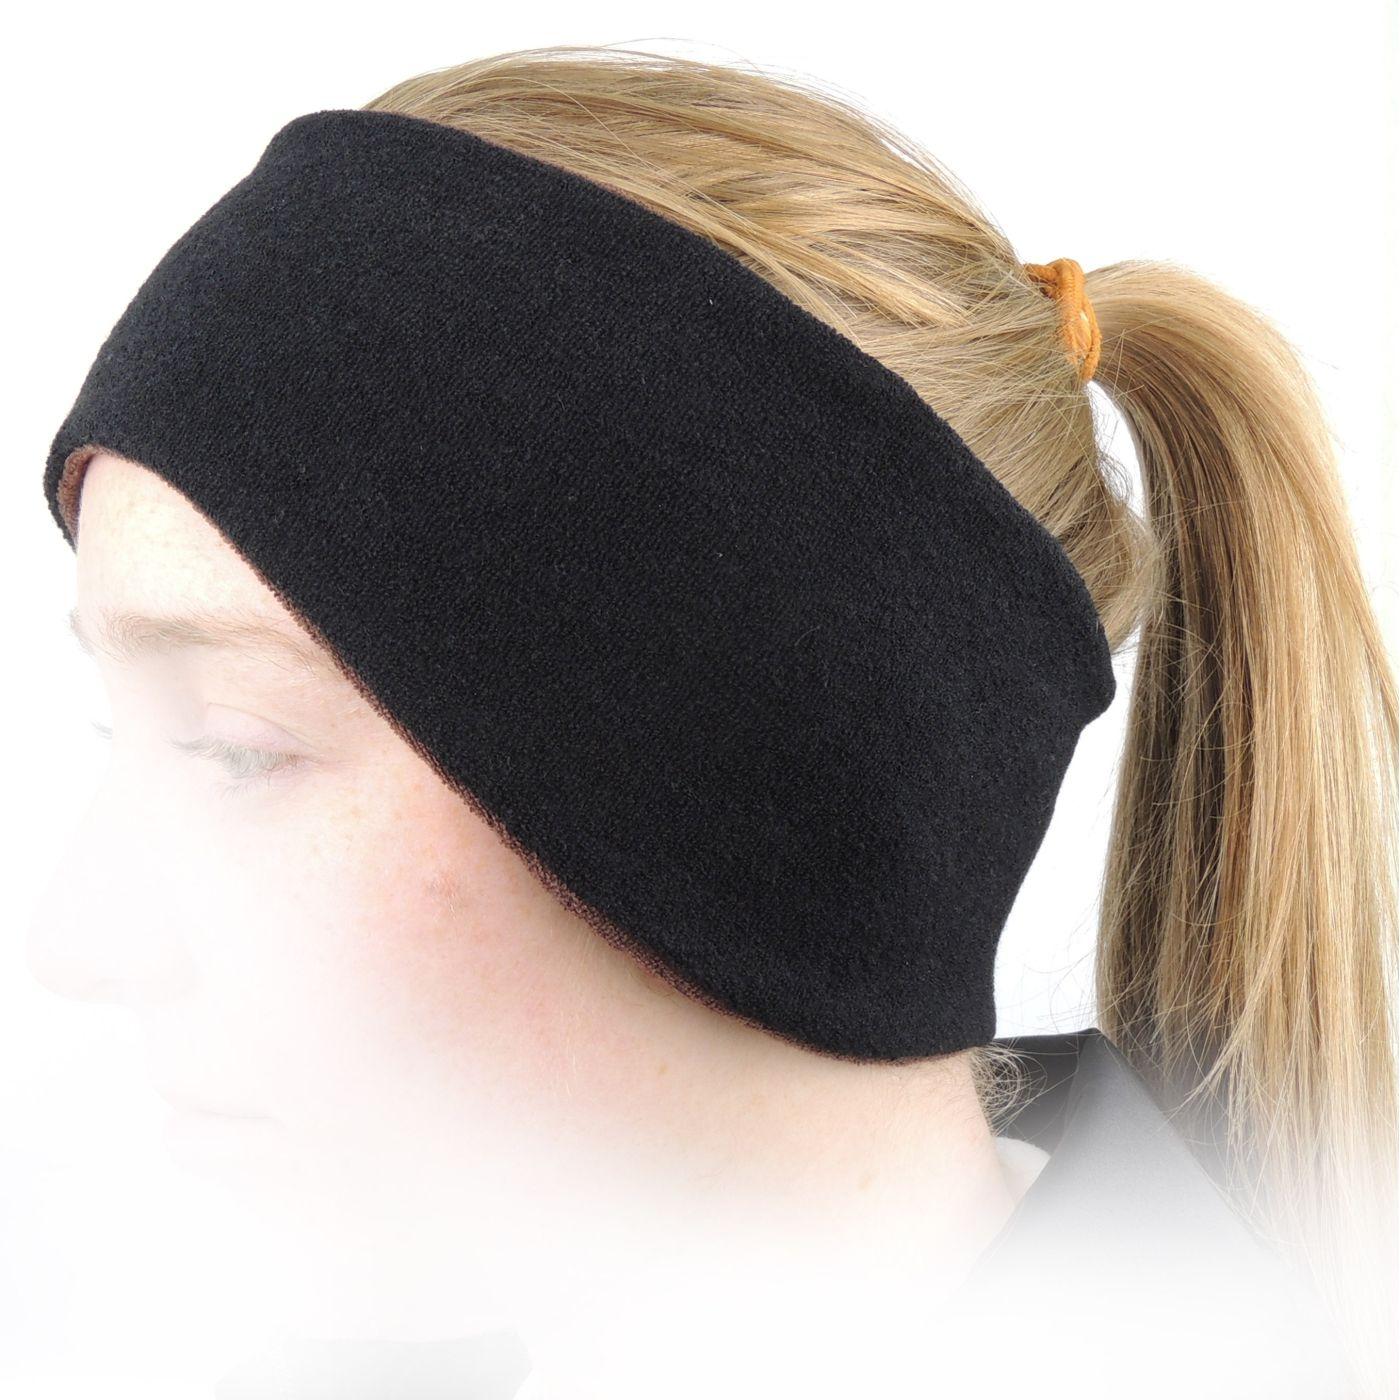 Protetor de Orelha Headband Thermo Fleece - fieroshop 9d3f31b8e18